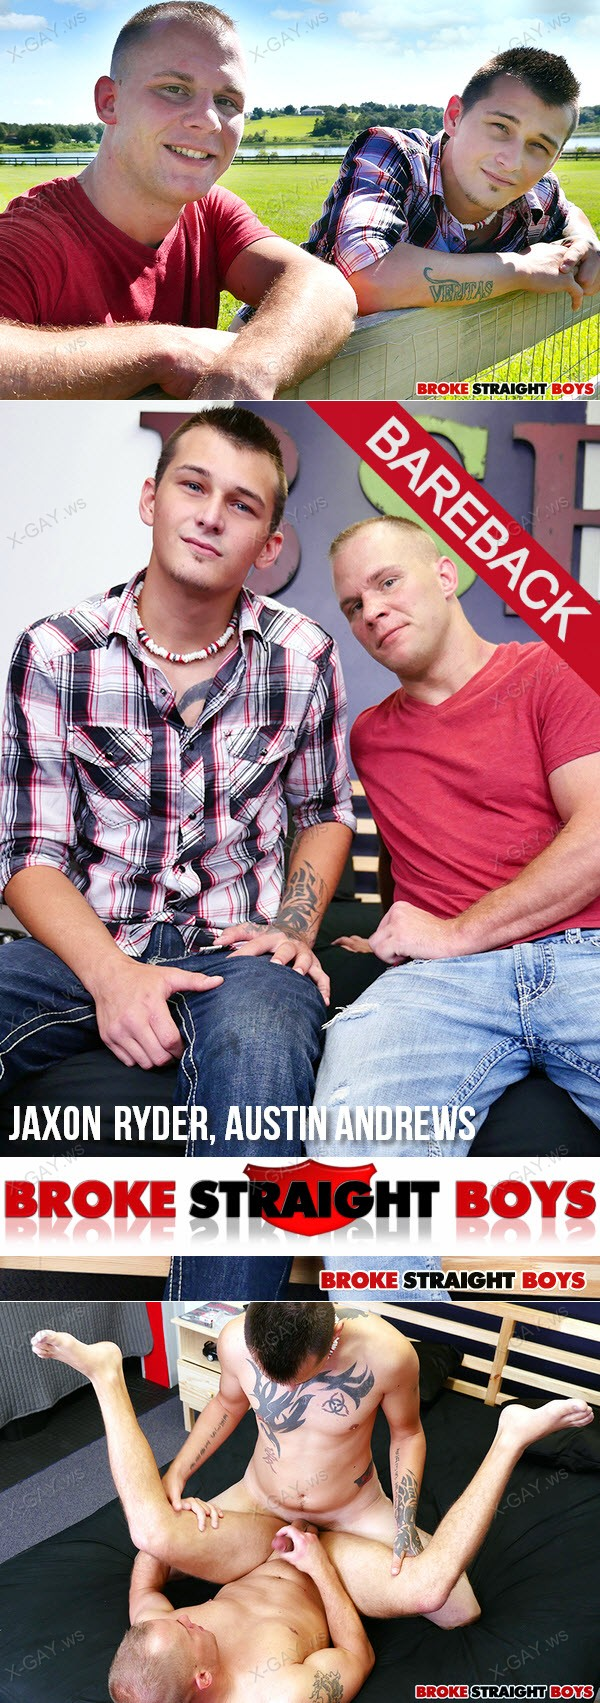 BrokeStraightBoys: Jaxon Ryder Fucks Austin Andrews Bareback